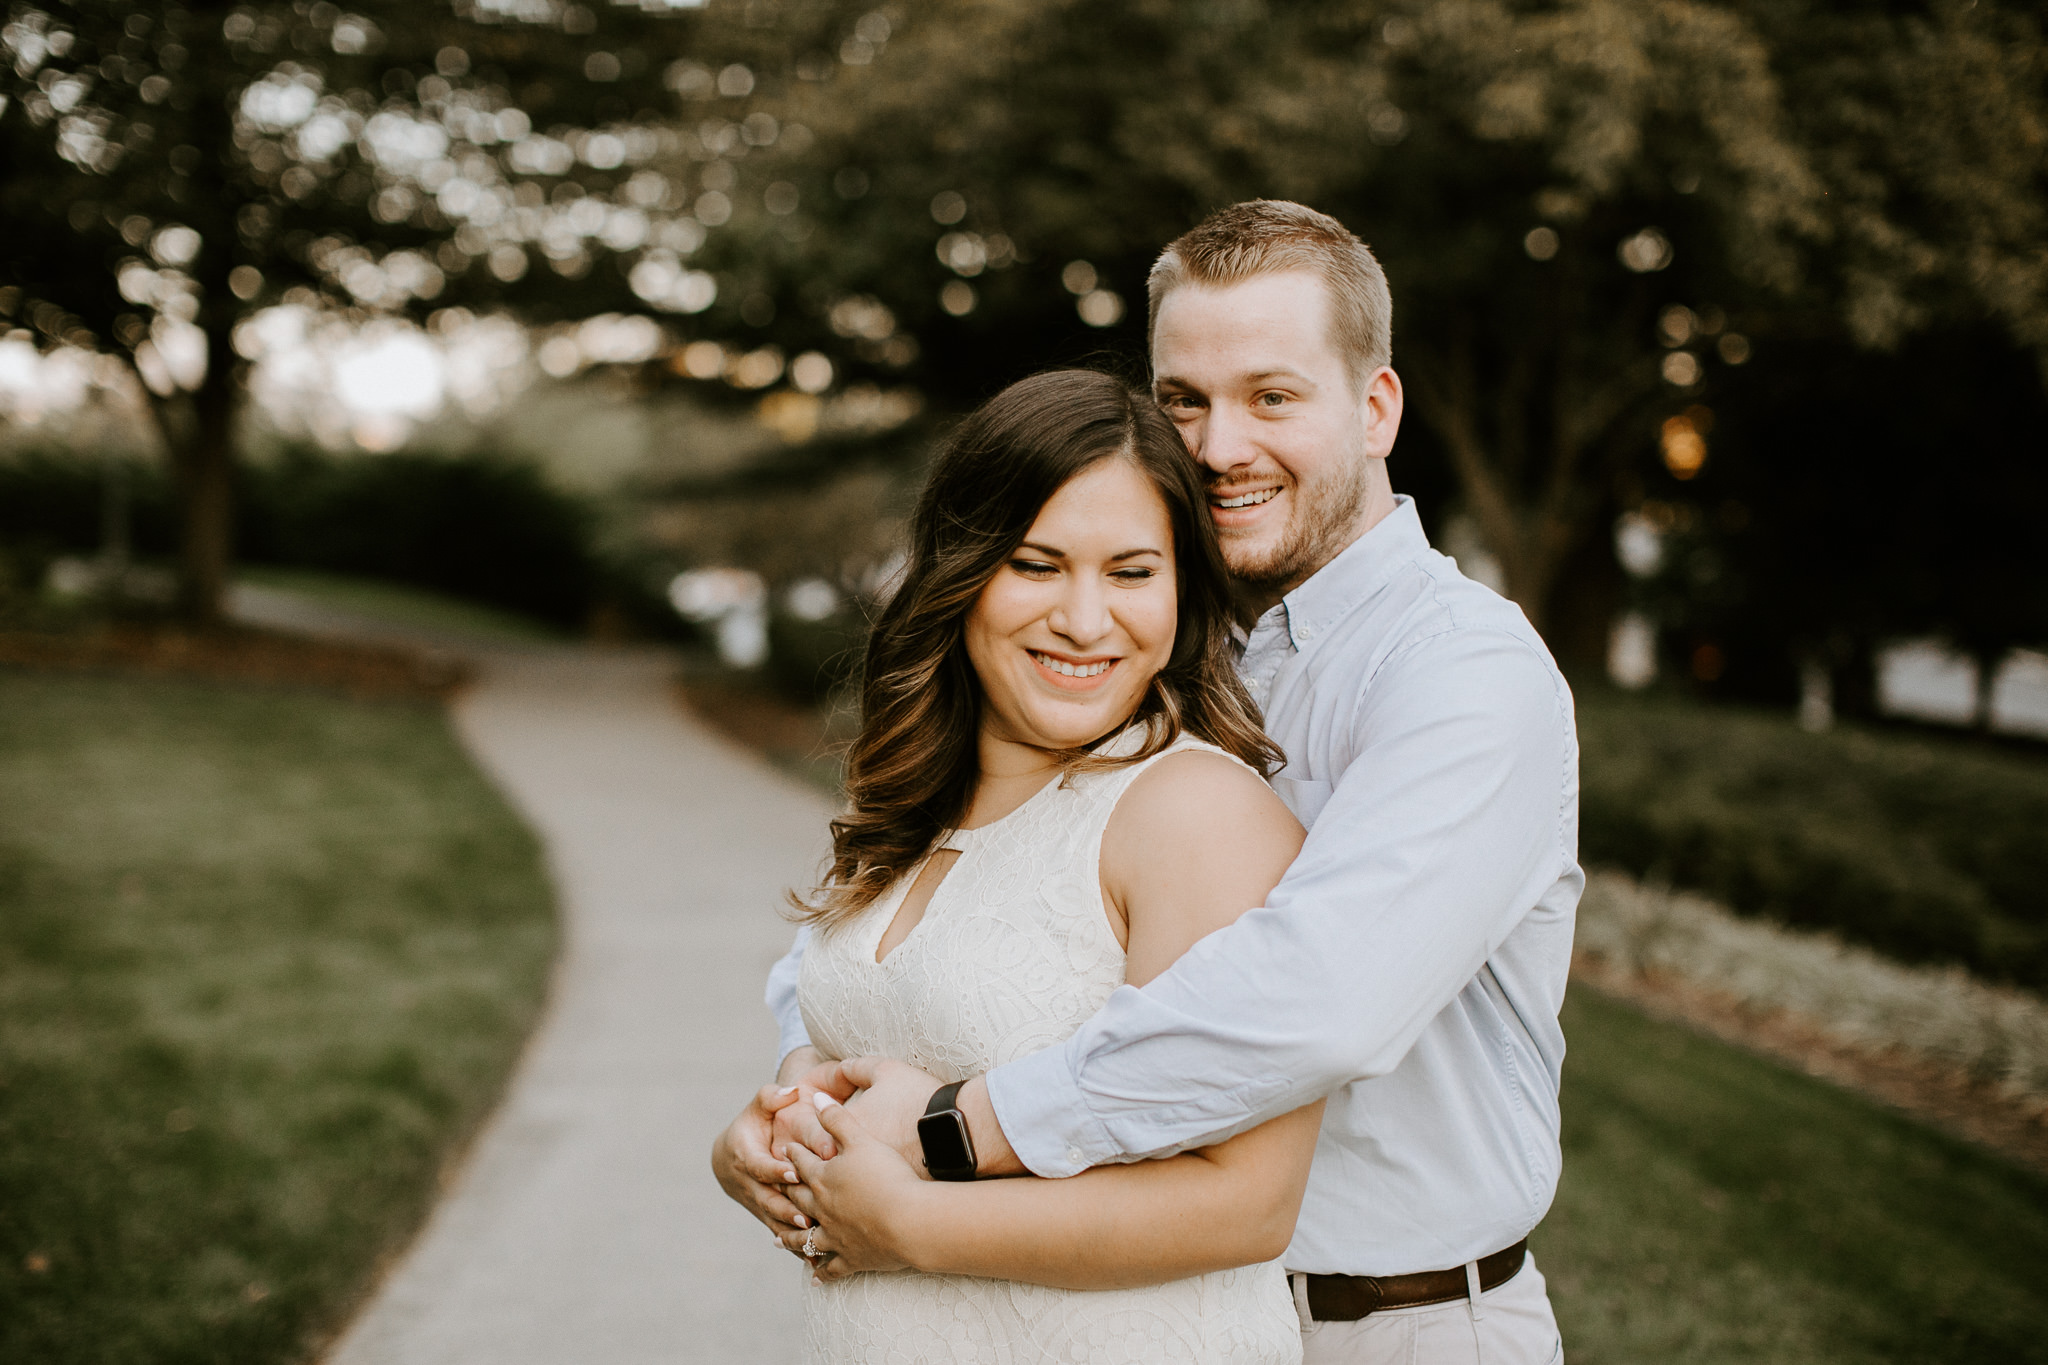 Engagement - Downtown Roanoke -  Wedding Photographer - Virginia - Best - Pat Cori Photography-25.jpg